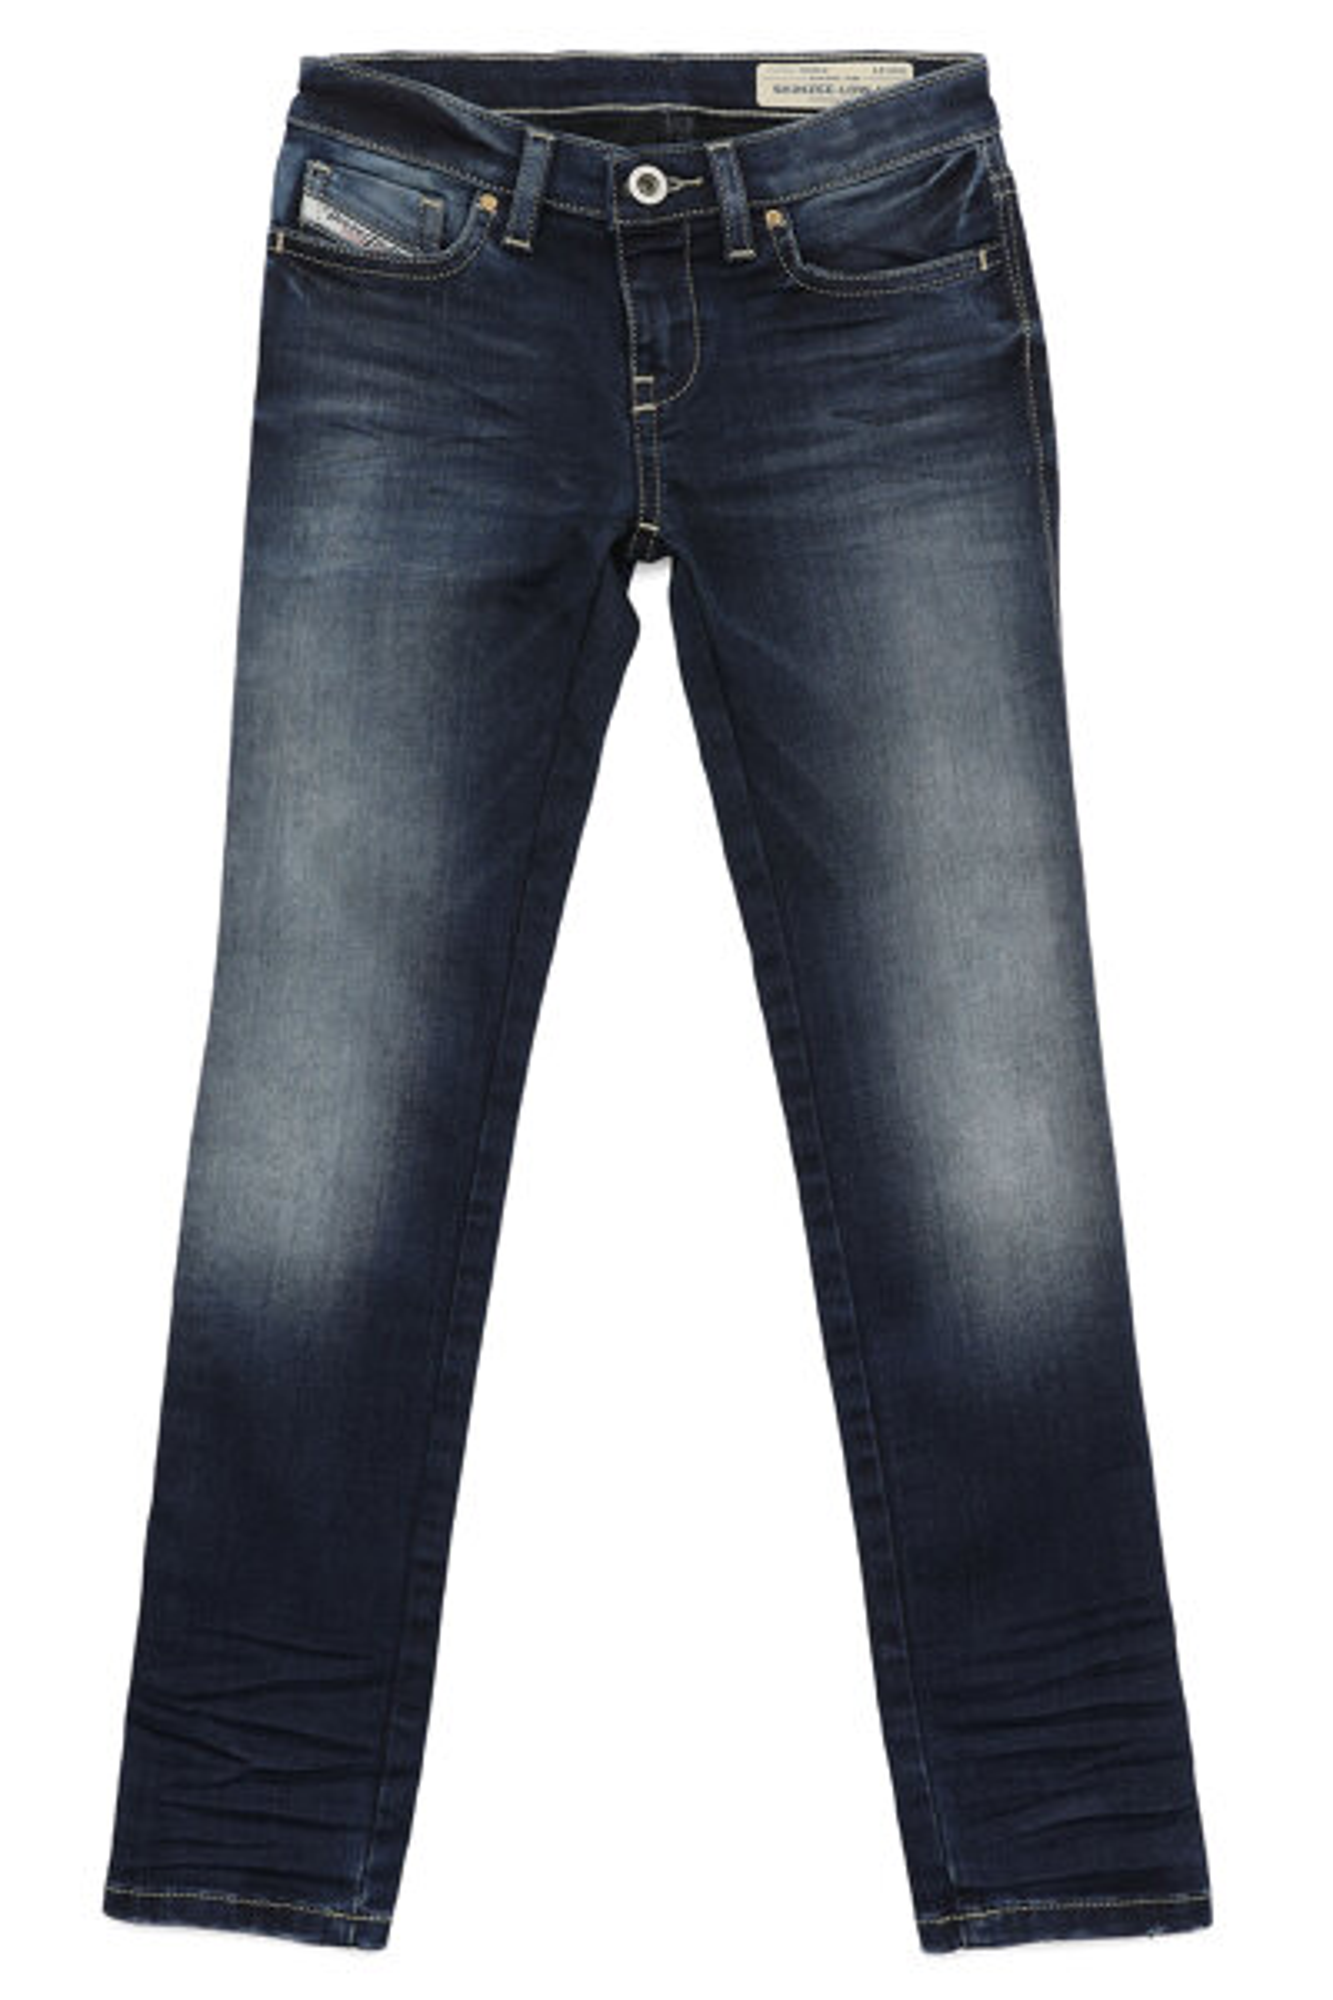 Pantaloni Skinzee-Low-JN - Diesel Kid